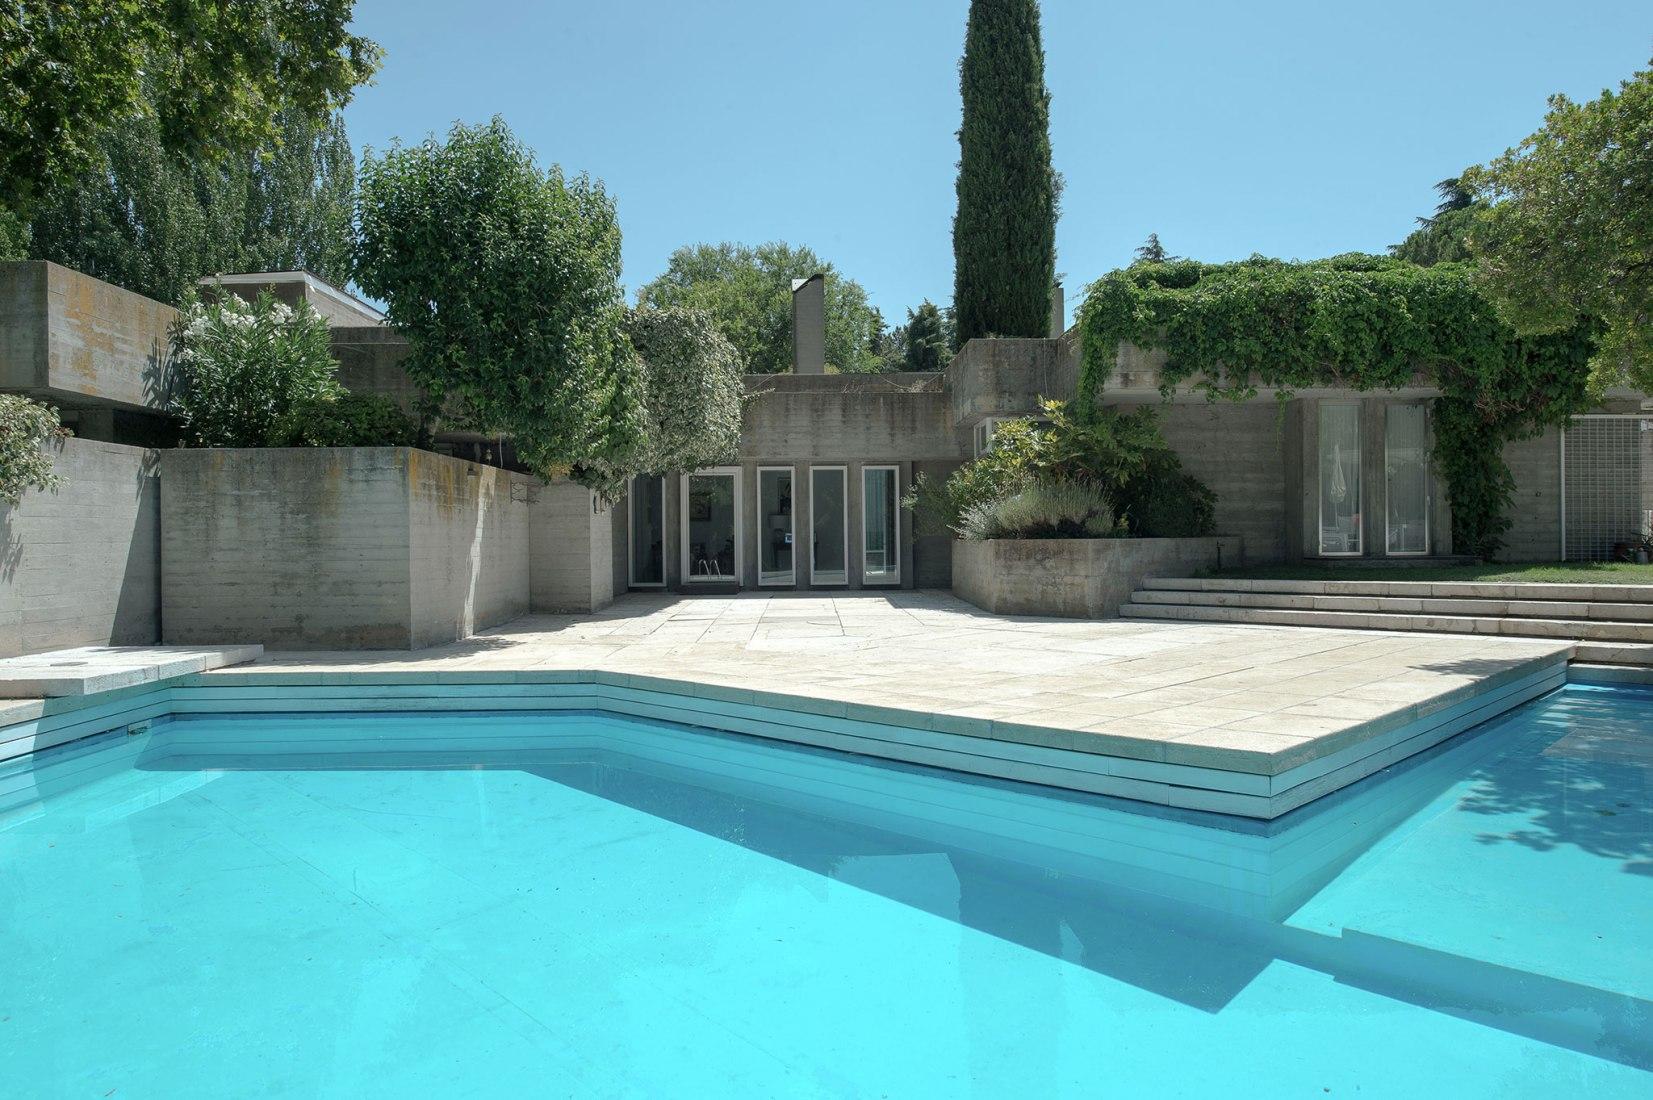 Carvajal House by Javier Carvajal Ferrer. Photograph courtesy of OHM - Cristina Rodriguez de Acuña